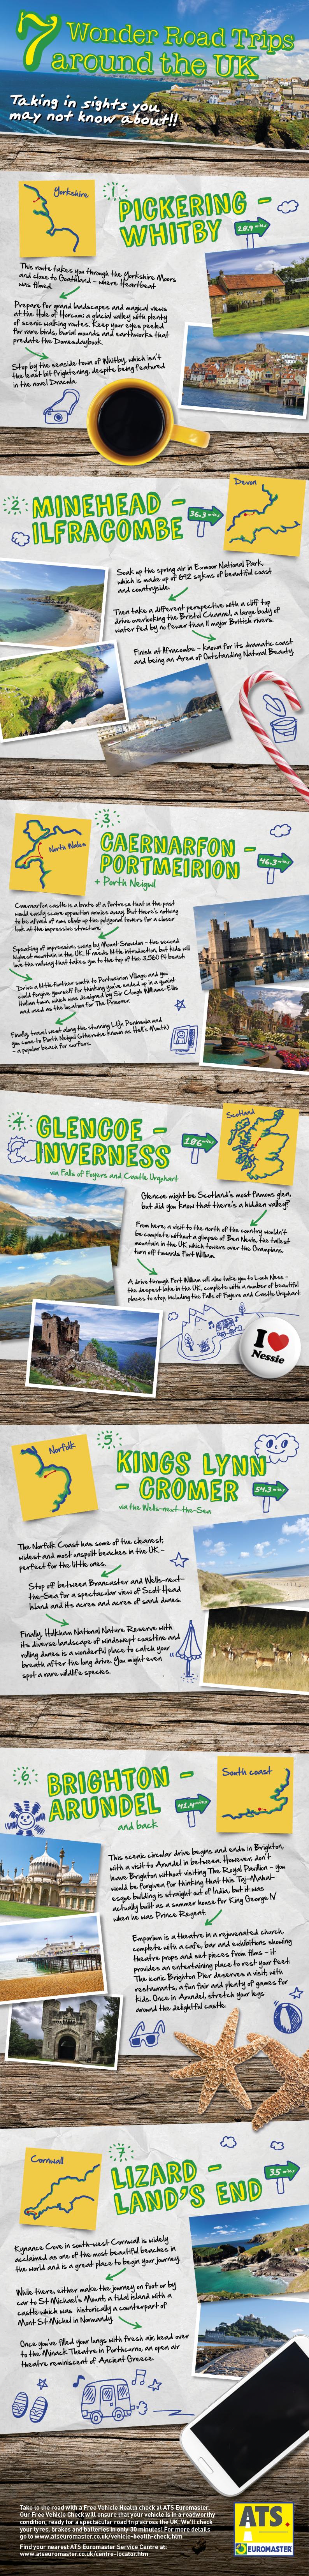 Seven Wonder Road Trips Around The UK